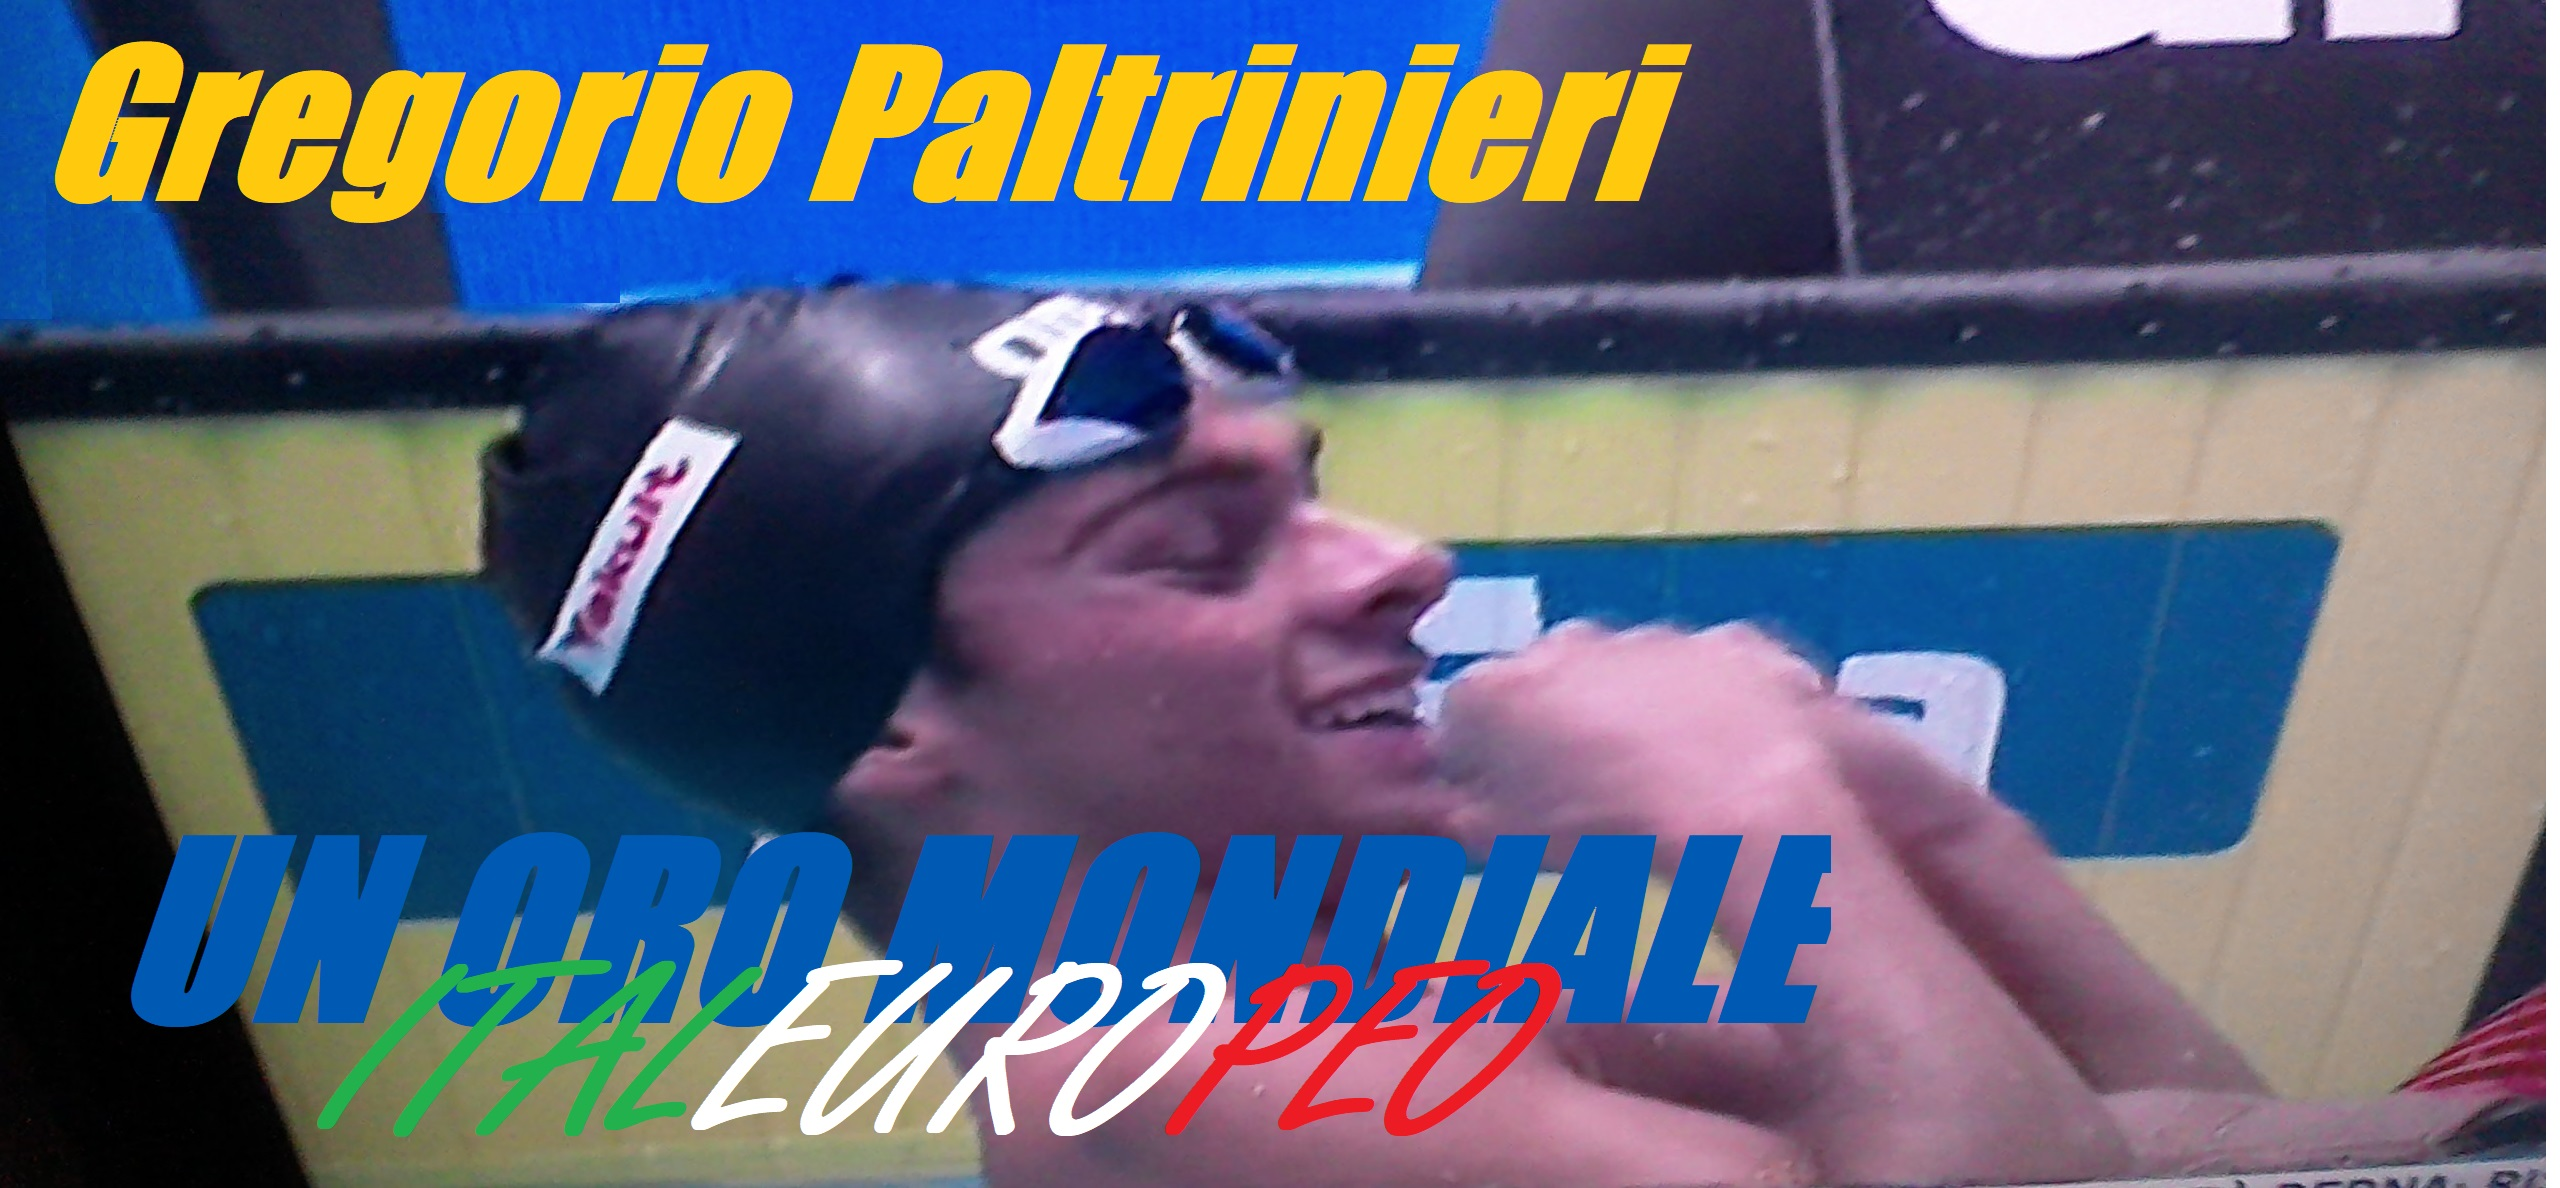 https://www.edizionidamiano.com/wp-content/uploads/2019/07/freeweb25lu2019.jpg